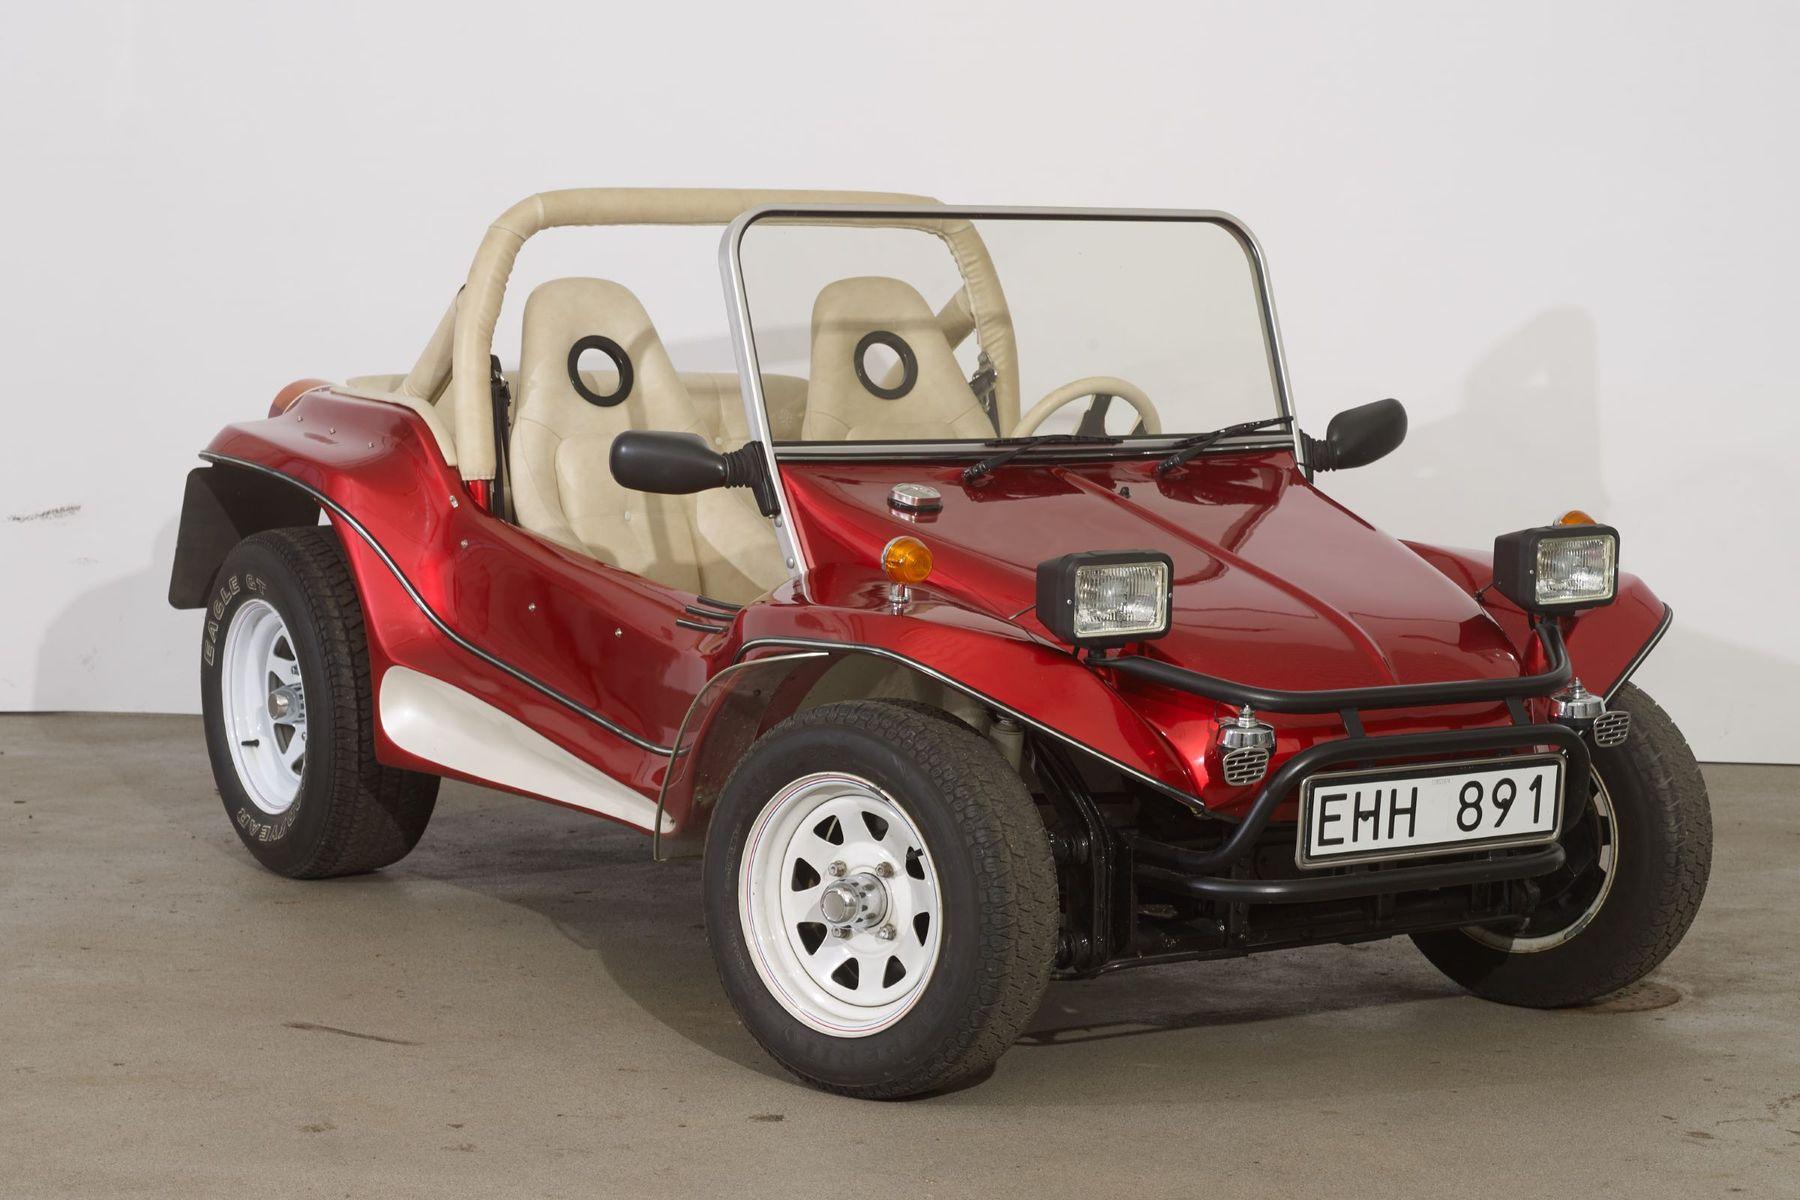 Beach Buggy (VW 1500, 1969) — 1969 on Bilweb Auctions on 2015 star ev golf cart, baja golf cart, maserati golf cart, dodge golf cart, jeep golf cart, cadillac golf cart, chevrolet golf cart, car golf cart, black golf cart, 6 seater golf cart, ferrari golf cart, trailer golf cart, motorcycle golf cart, bmw golf cart, atv golf cart, balloon golf cart, woody golf cart, mercedes golf cart, land rover golf cart, hummer golf cart,